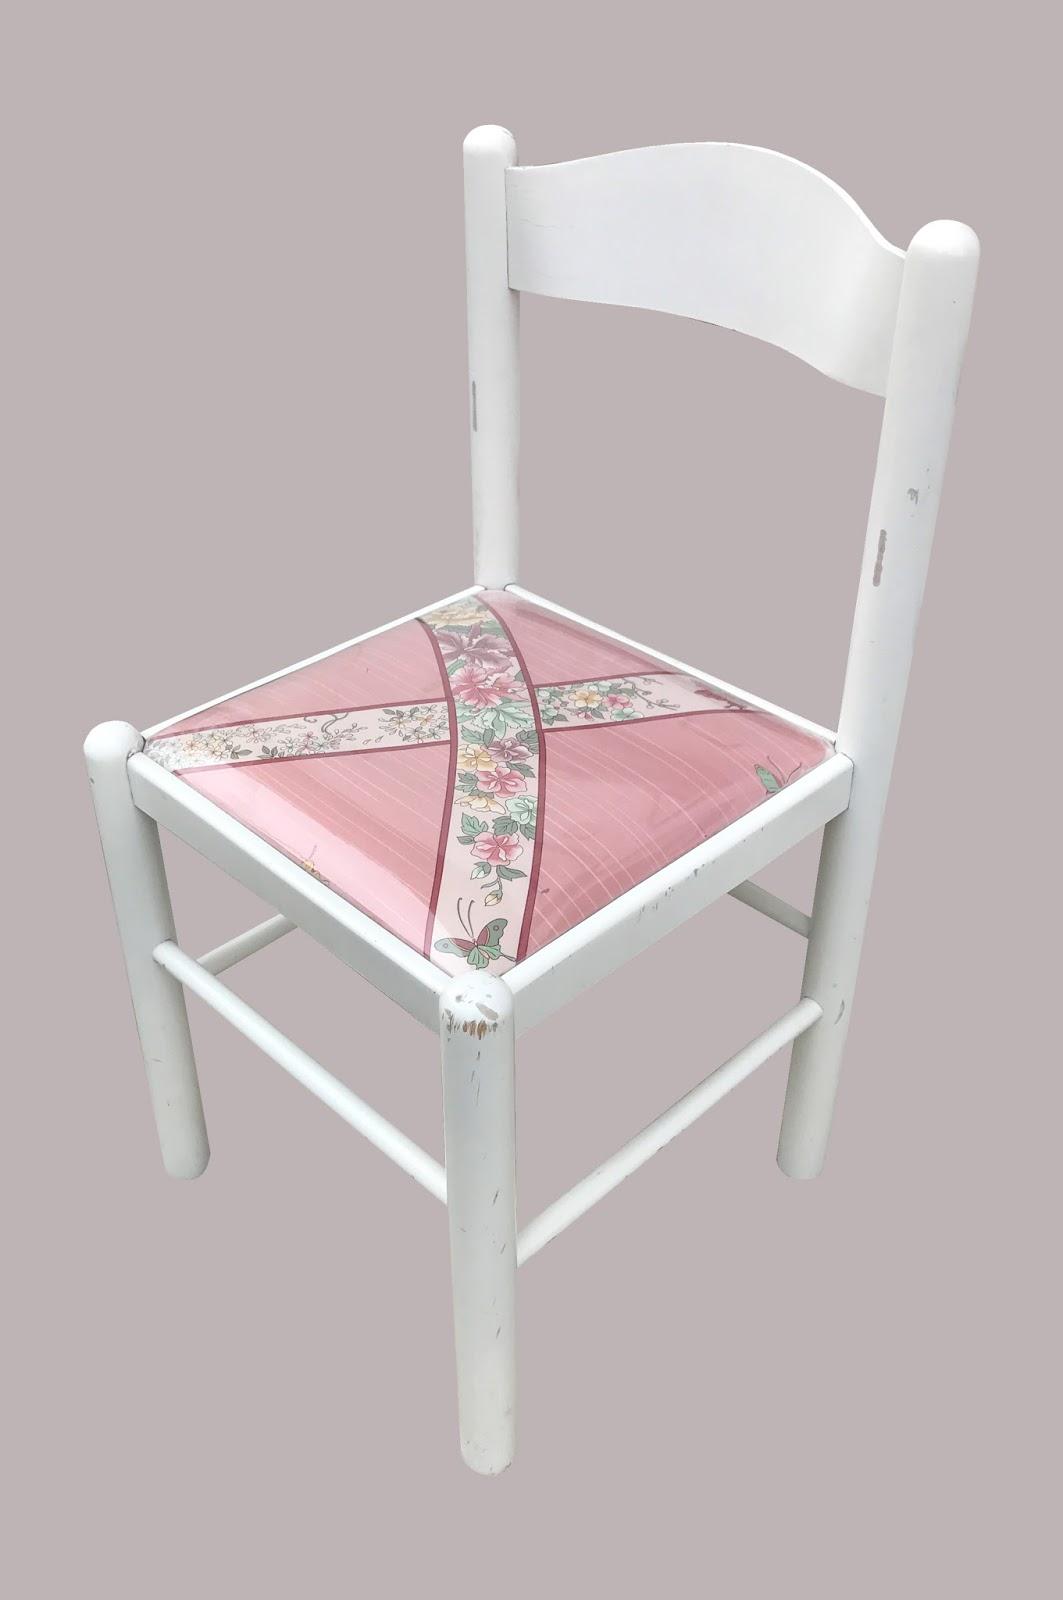 uhuru furniture collectibles 3 pc pink bedroom set 95 sold